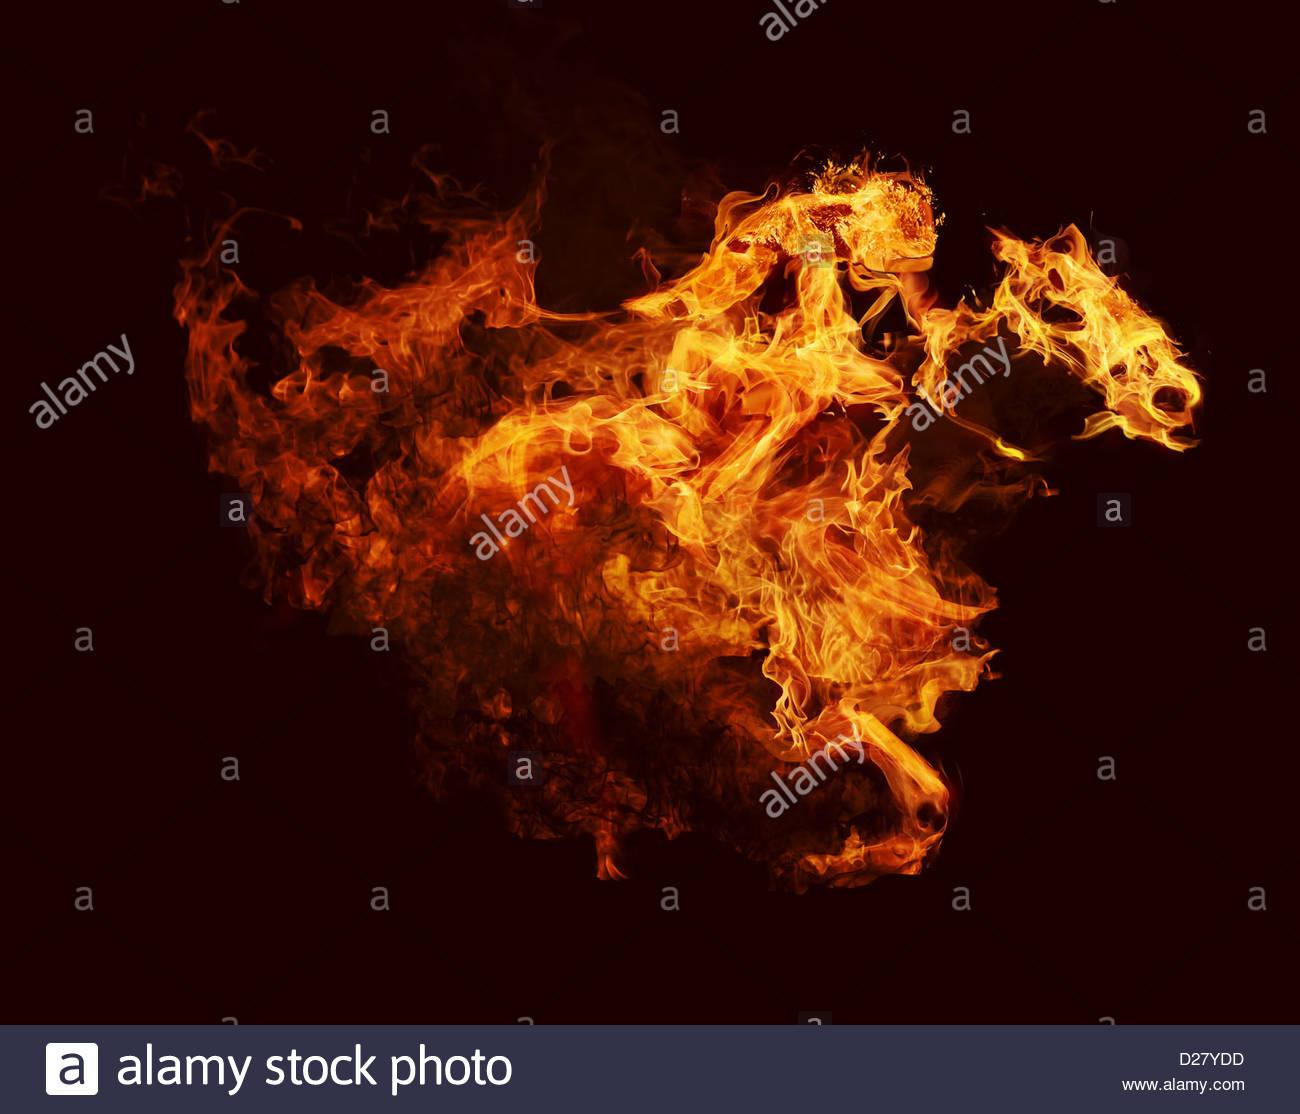 Flammes en forme de cheval et jockey Photo Stock